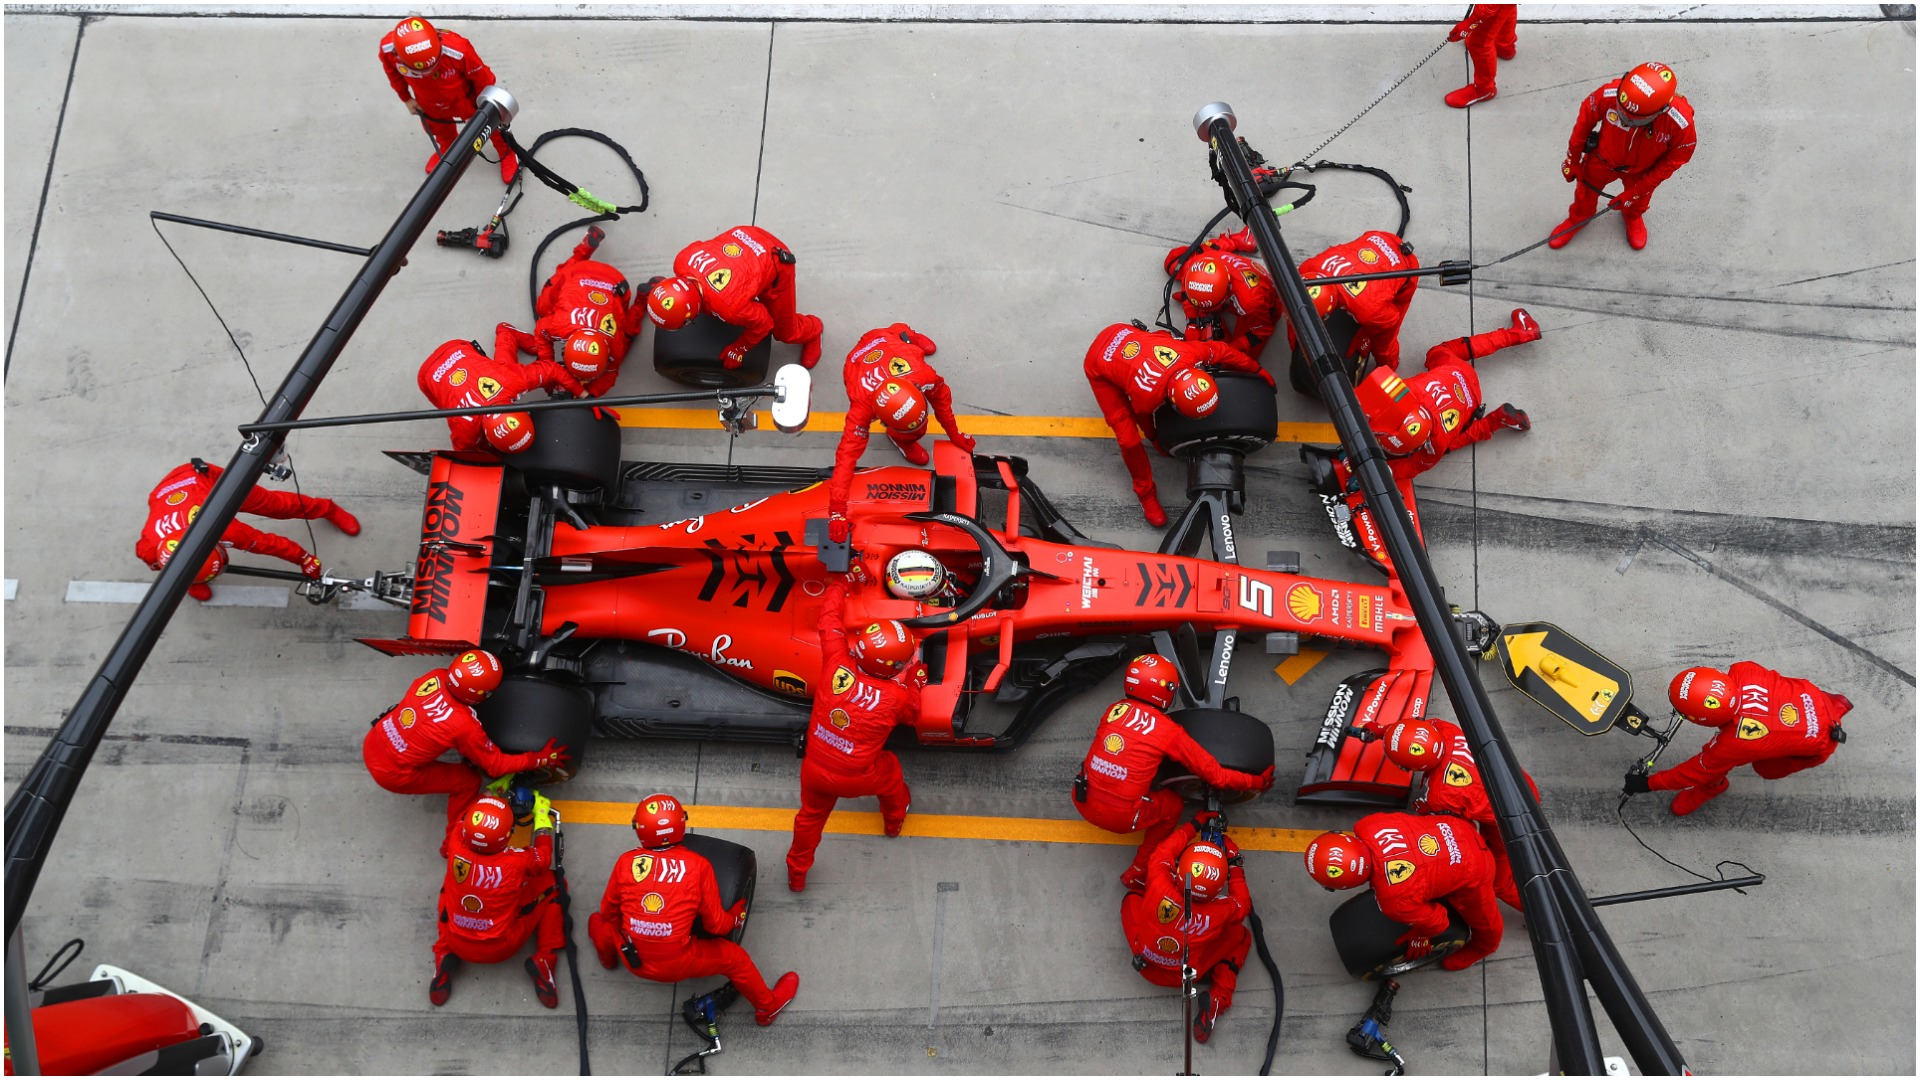 F1 Raceweek: Ferrari looking to kick-start season with SF90 updates in Baku